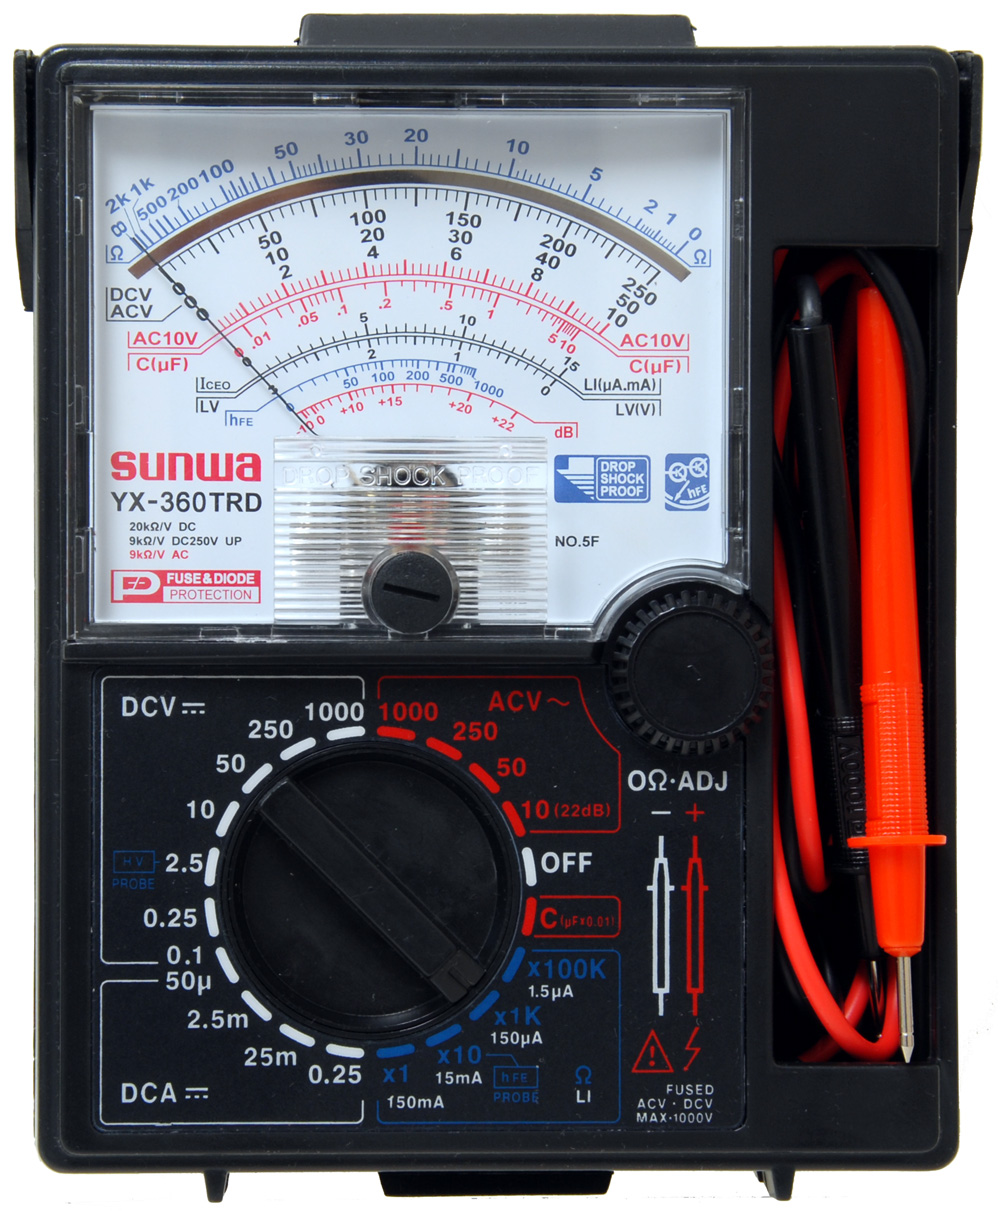 Digital Analog Multimeter : Appliance repair training online self paced courses very